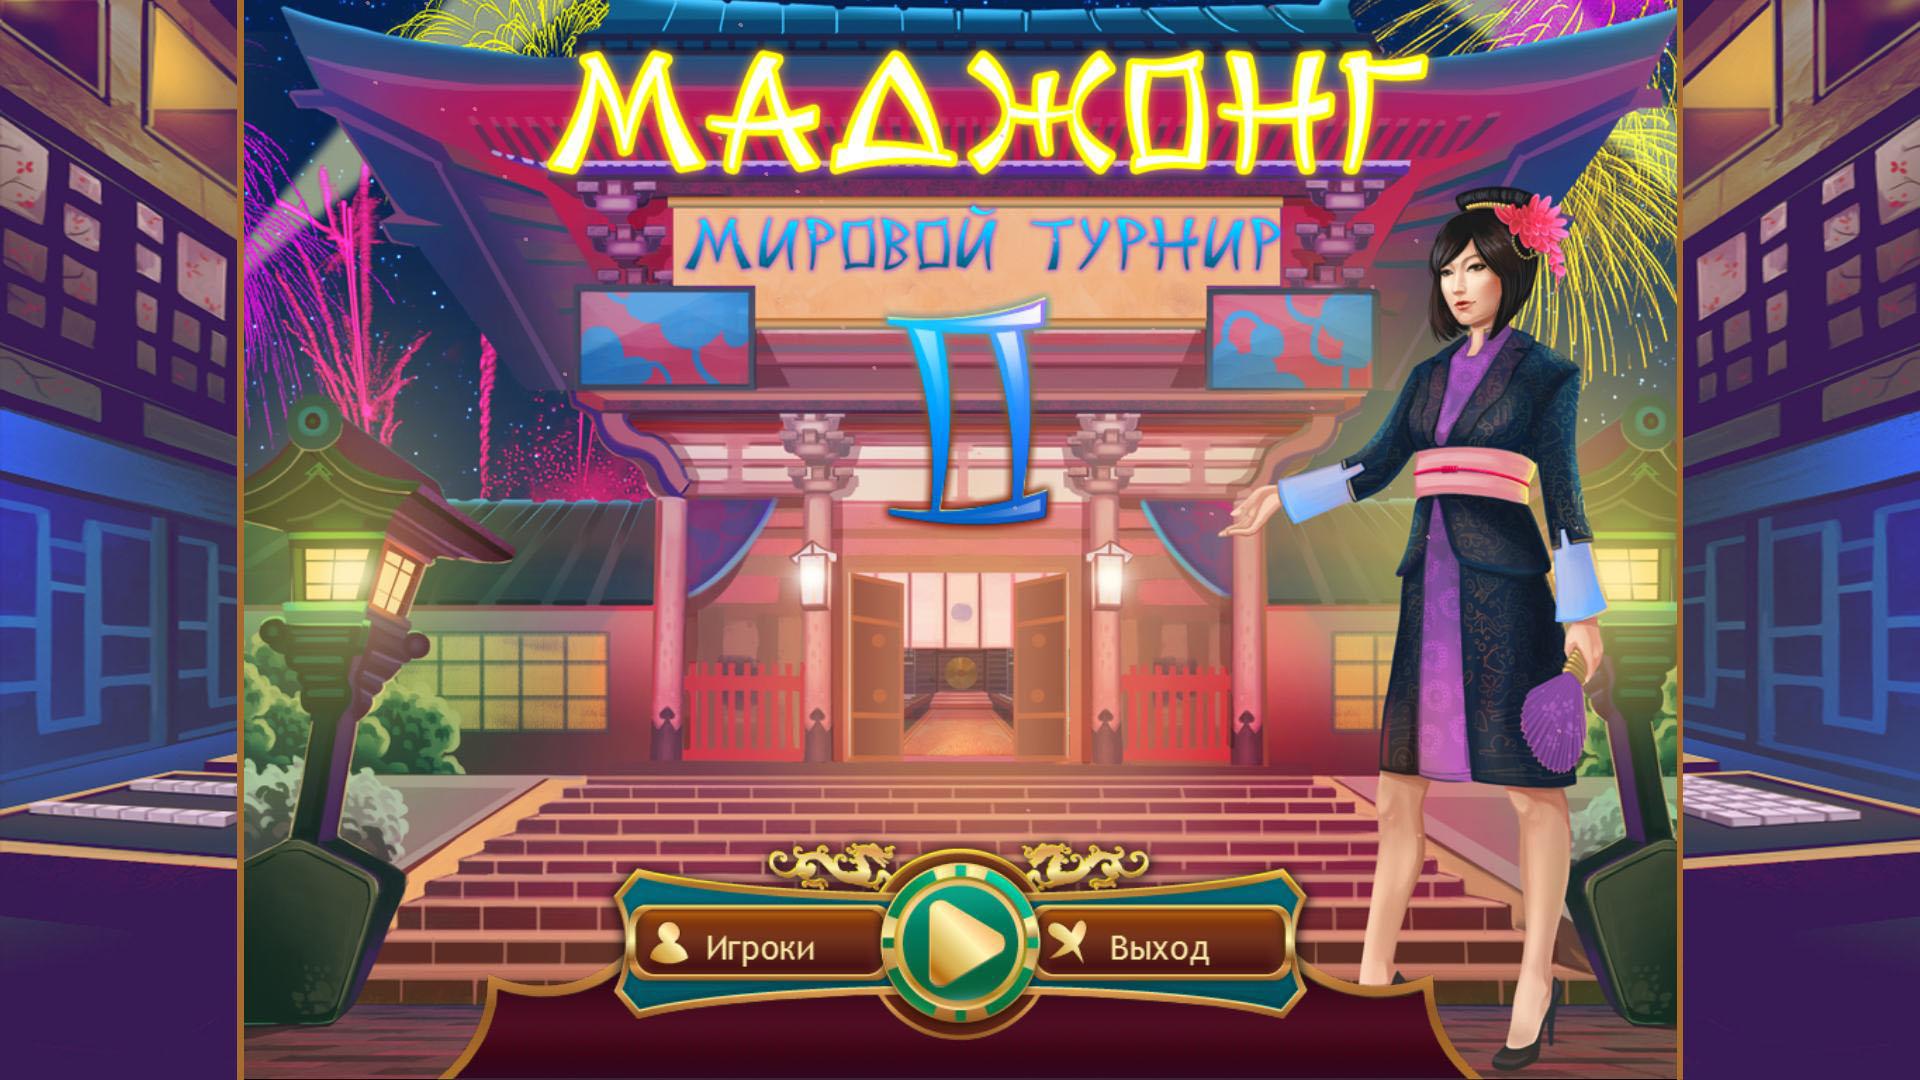 Маджонг. Мировой турнир 2 | Mahjong: World Contest 2 (Rus)